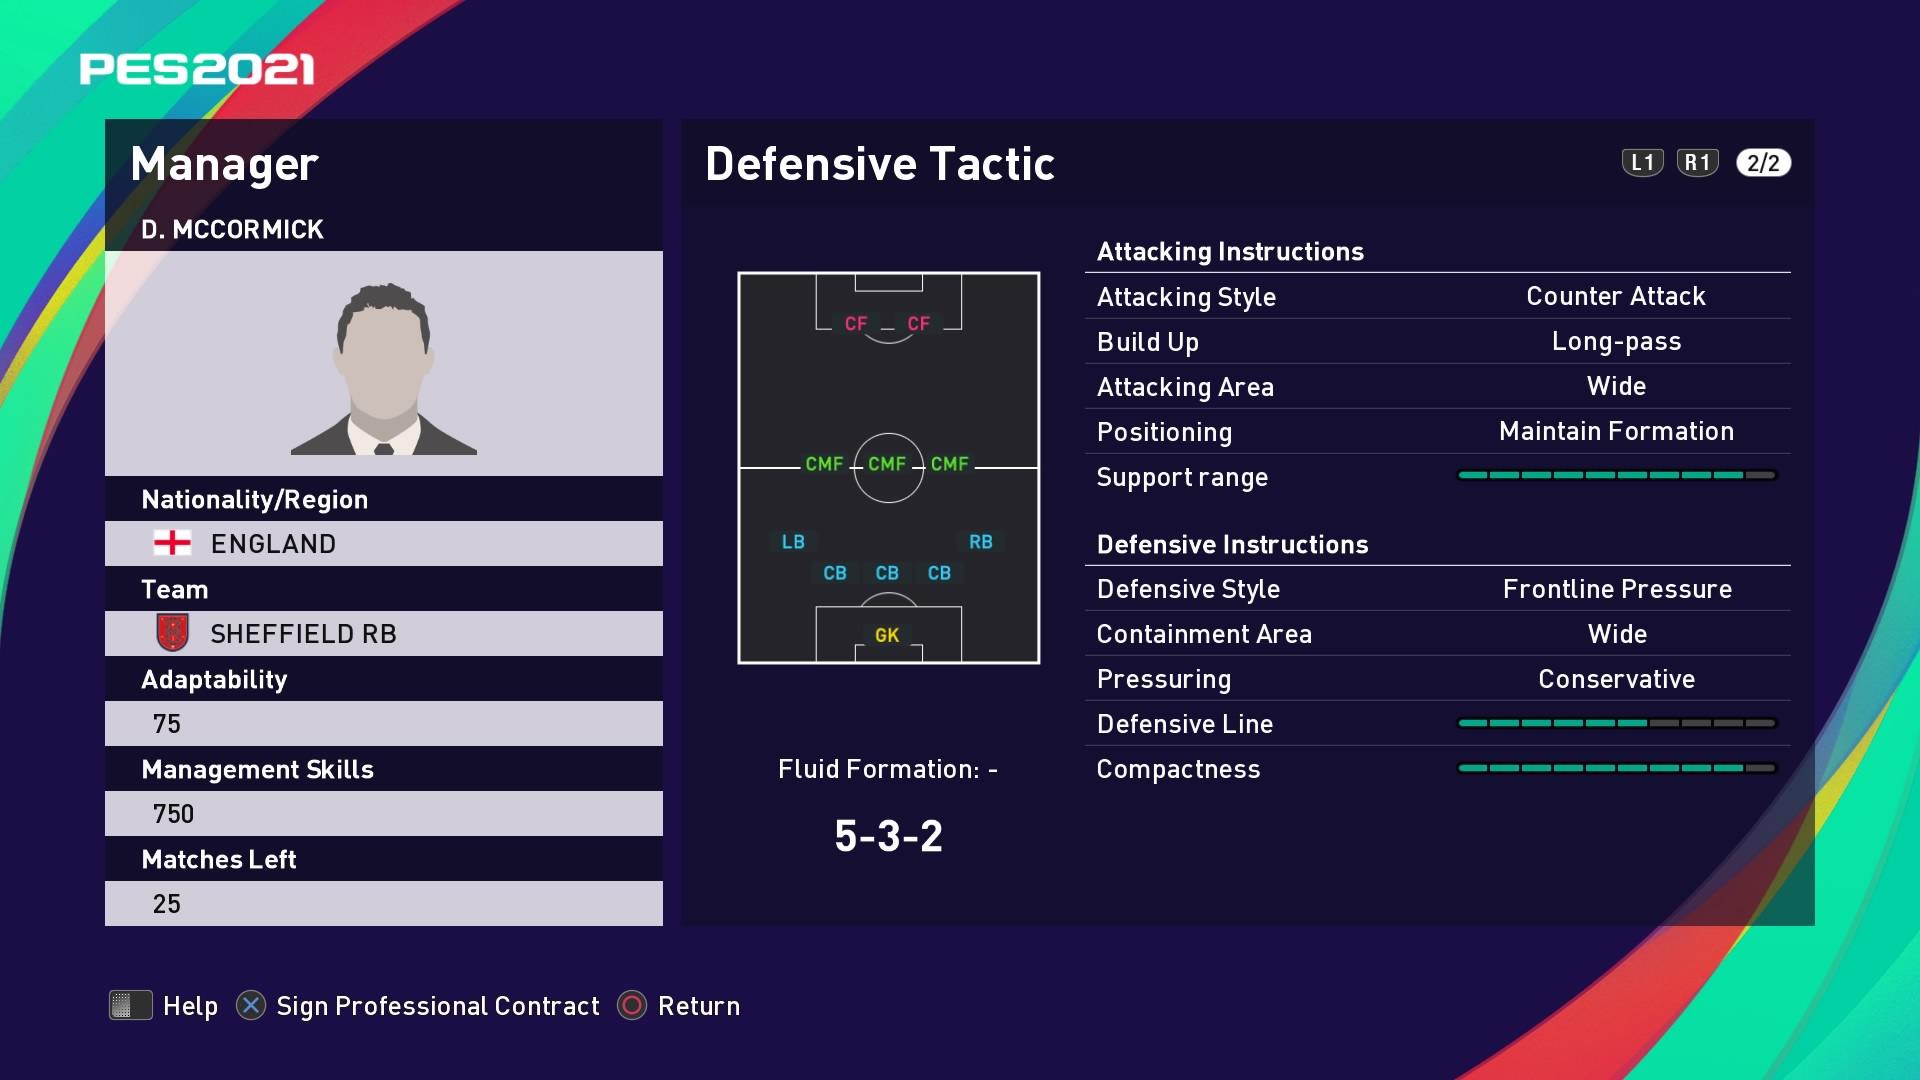 D. McCormick (Chris Wilder) Defensive Tactic in PES 2021 myClub